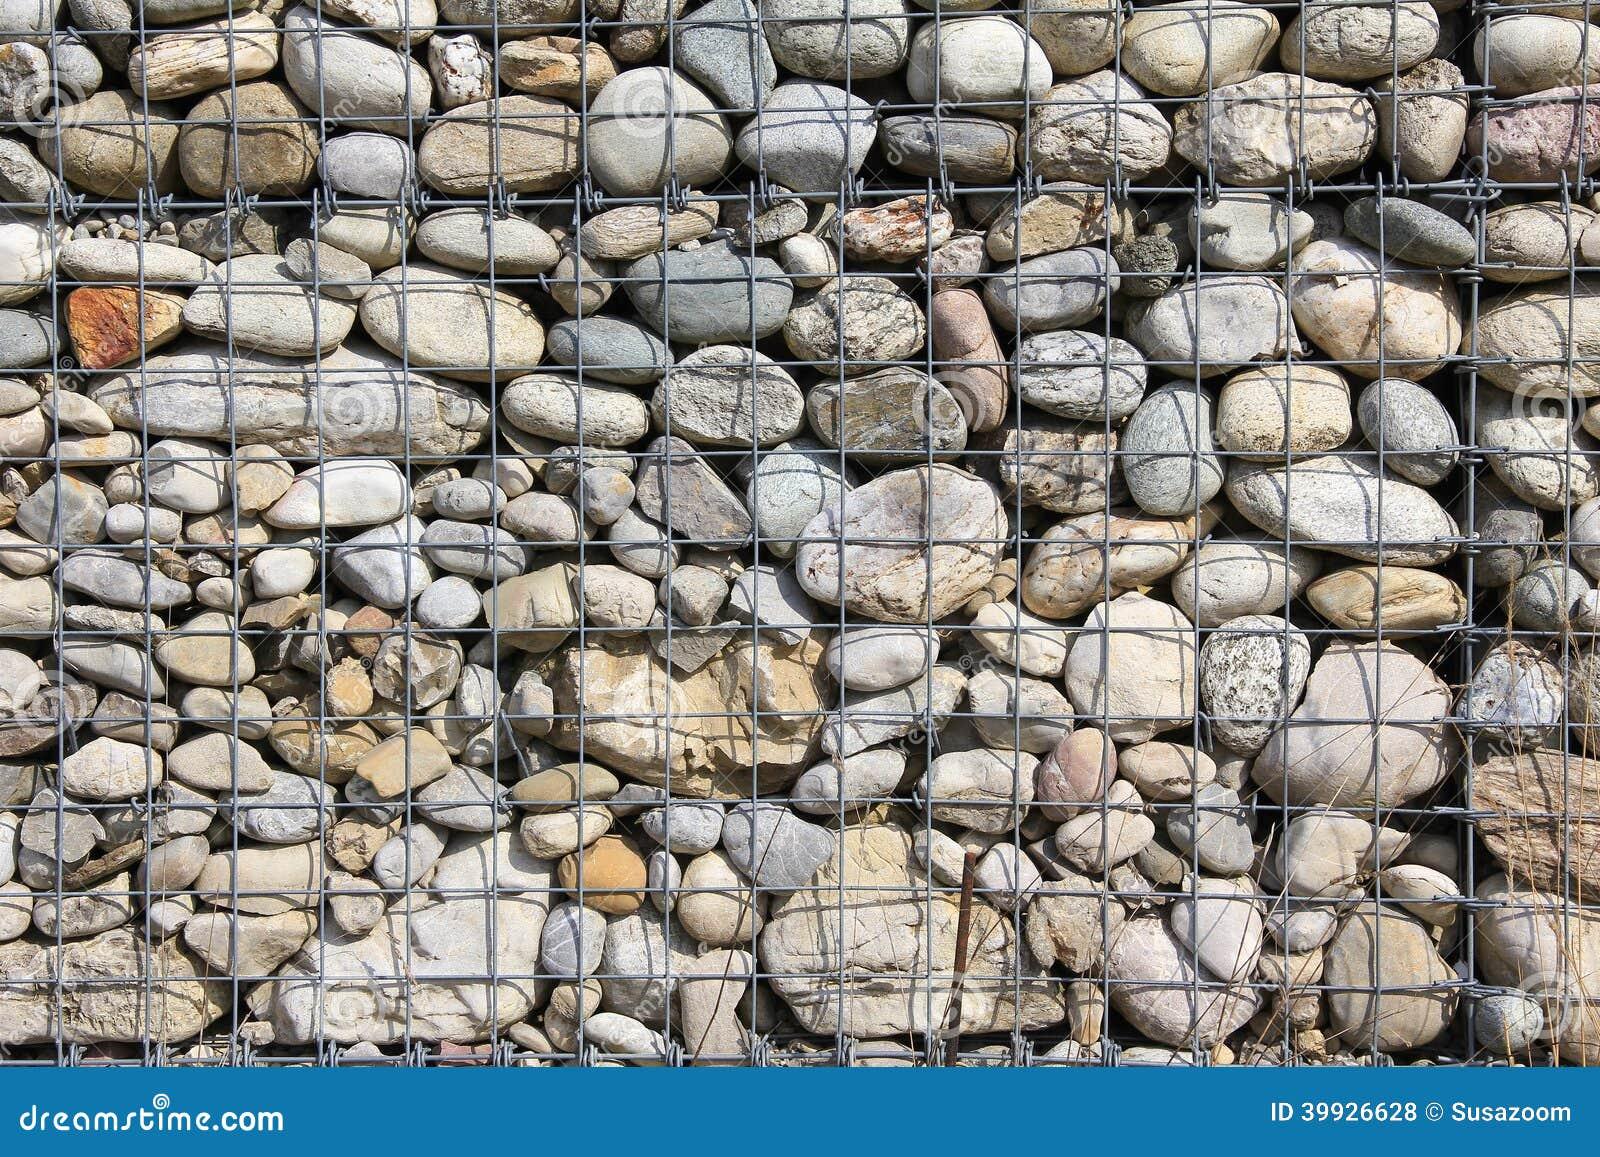 Modern Natural Stone : Modern natural filled stone wall stock photo image